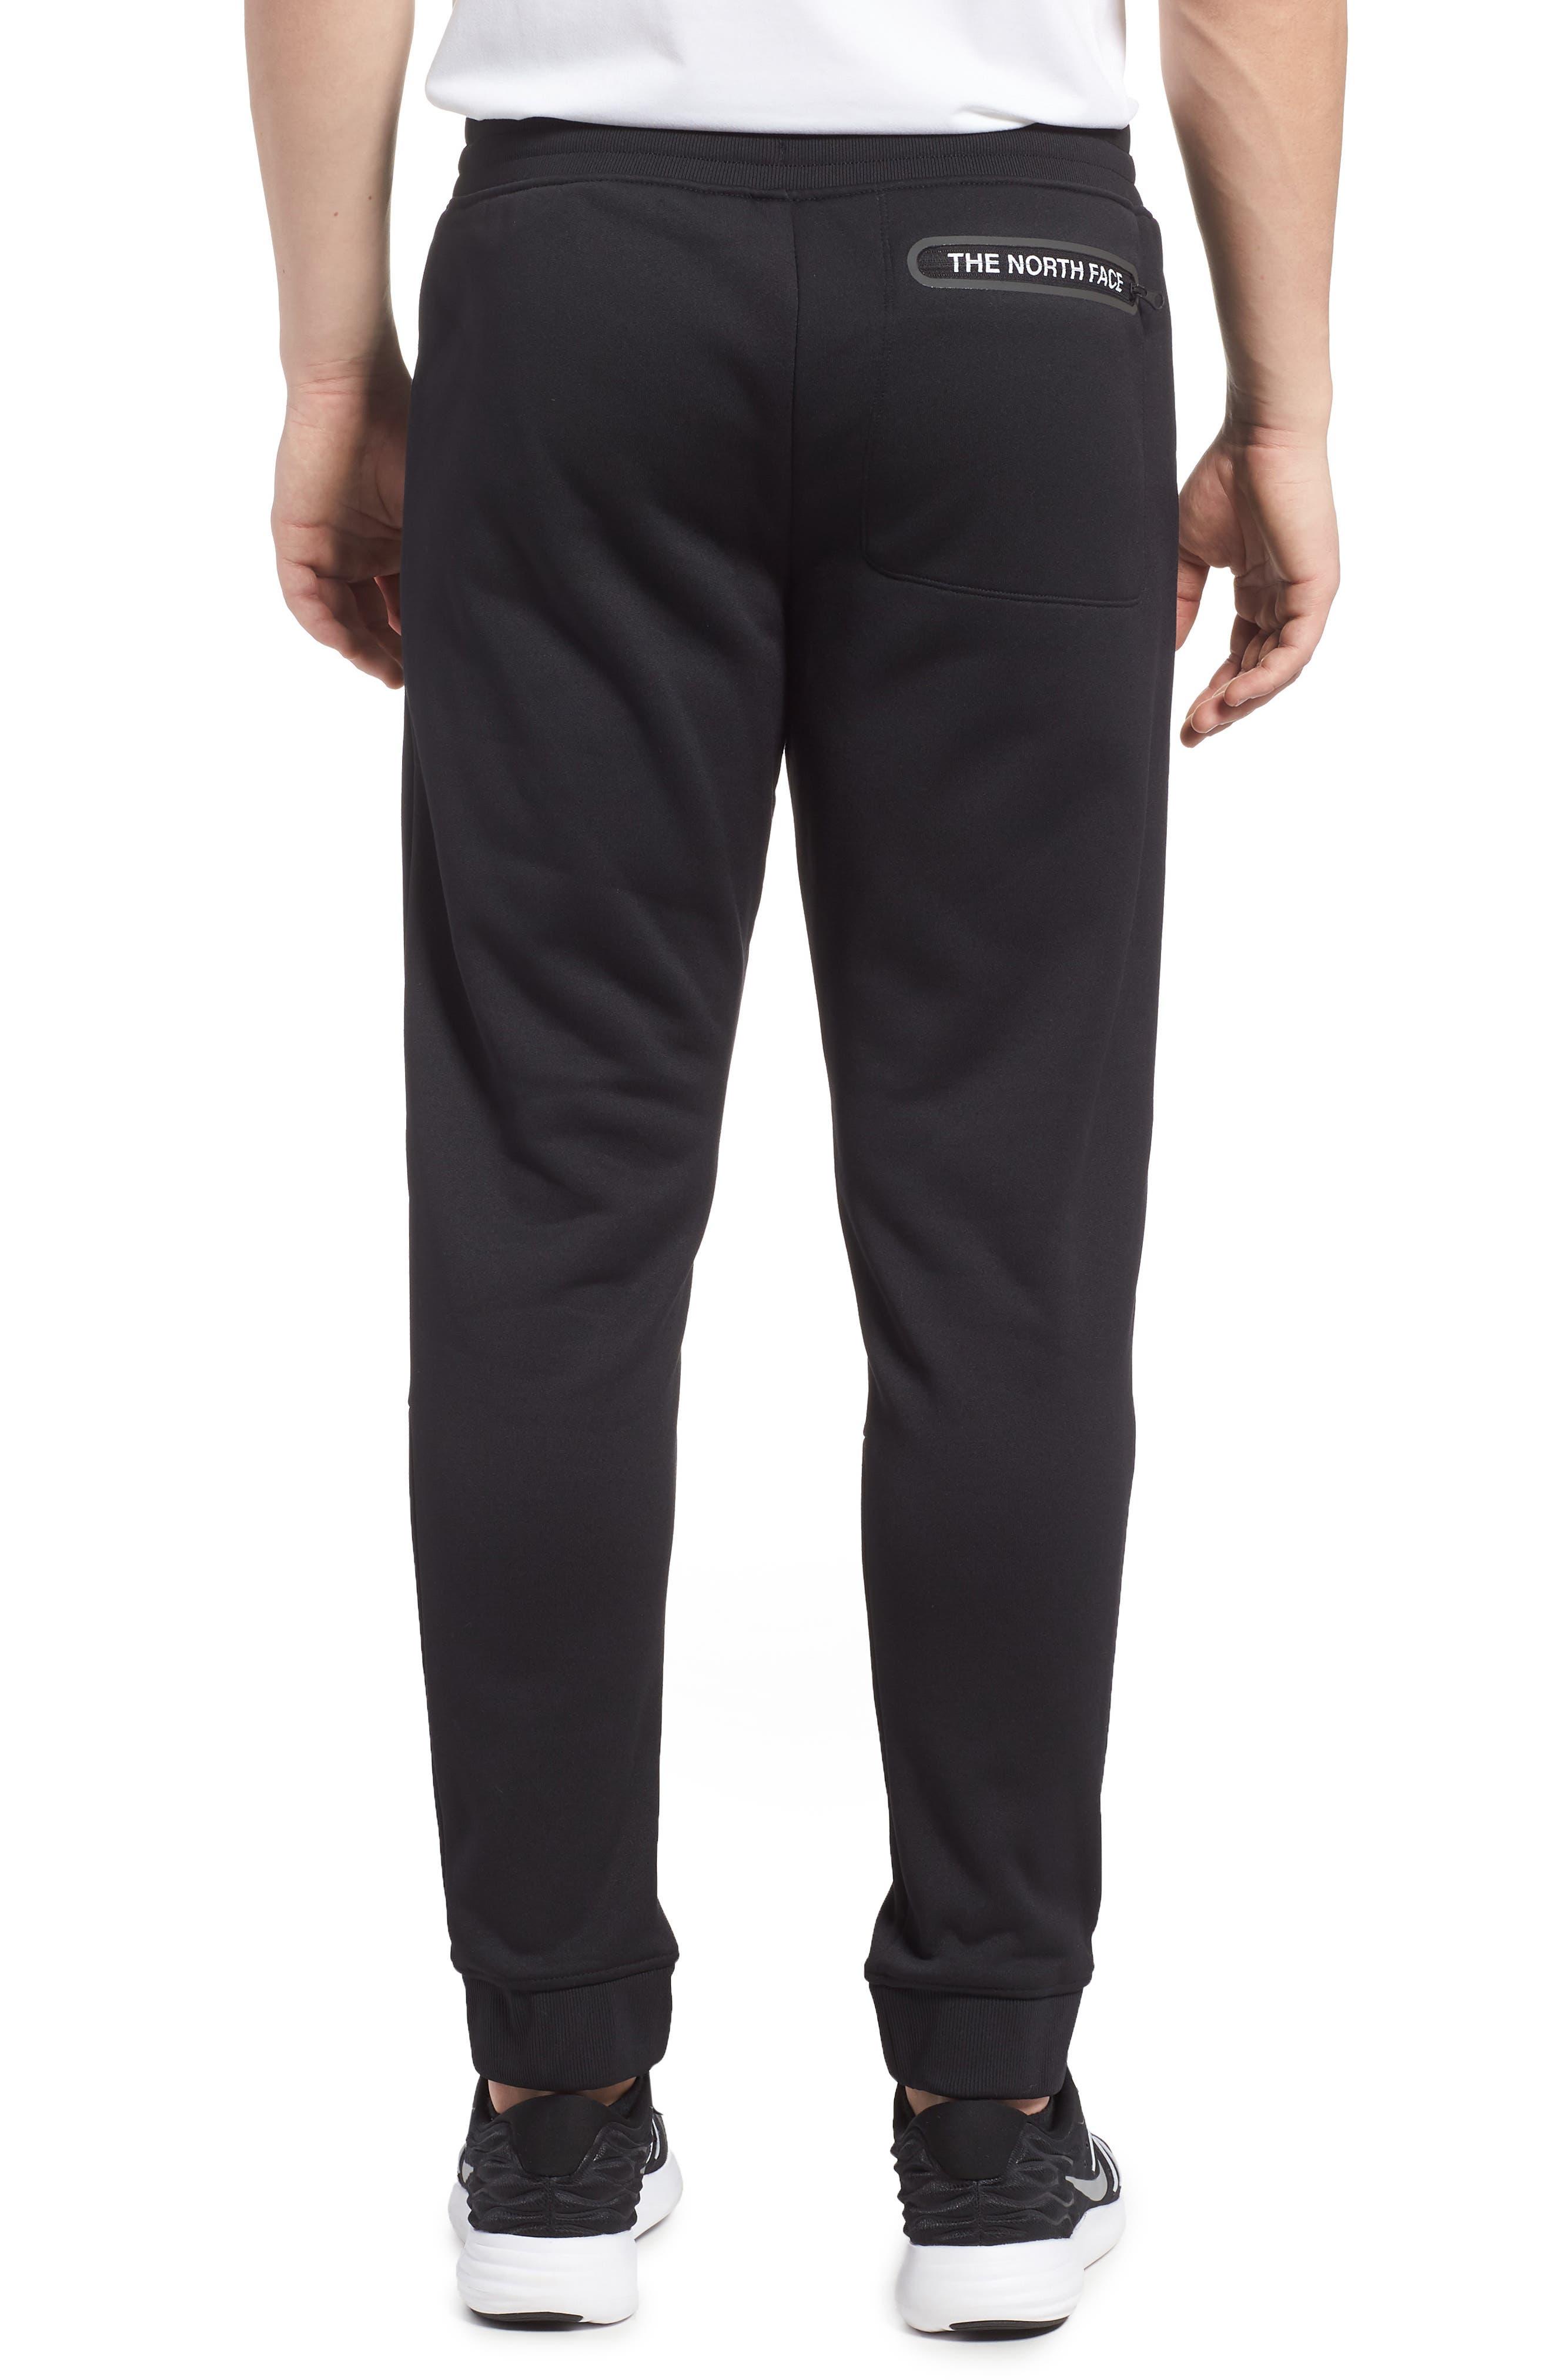 Mount Modern Jogger Pants,                             Alternate thumbnail 2, color,                             Tnf Black